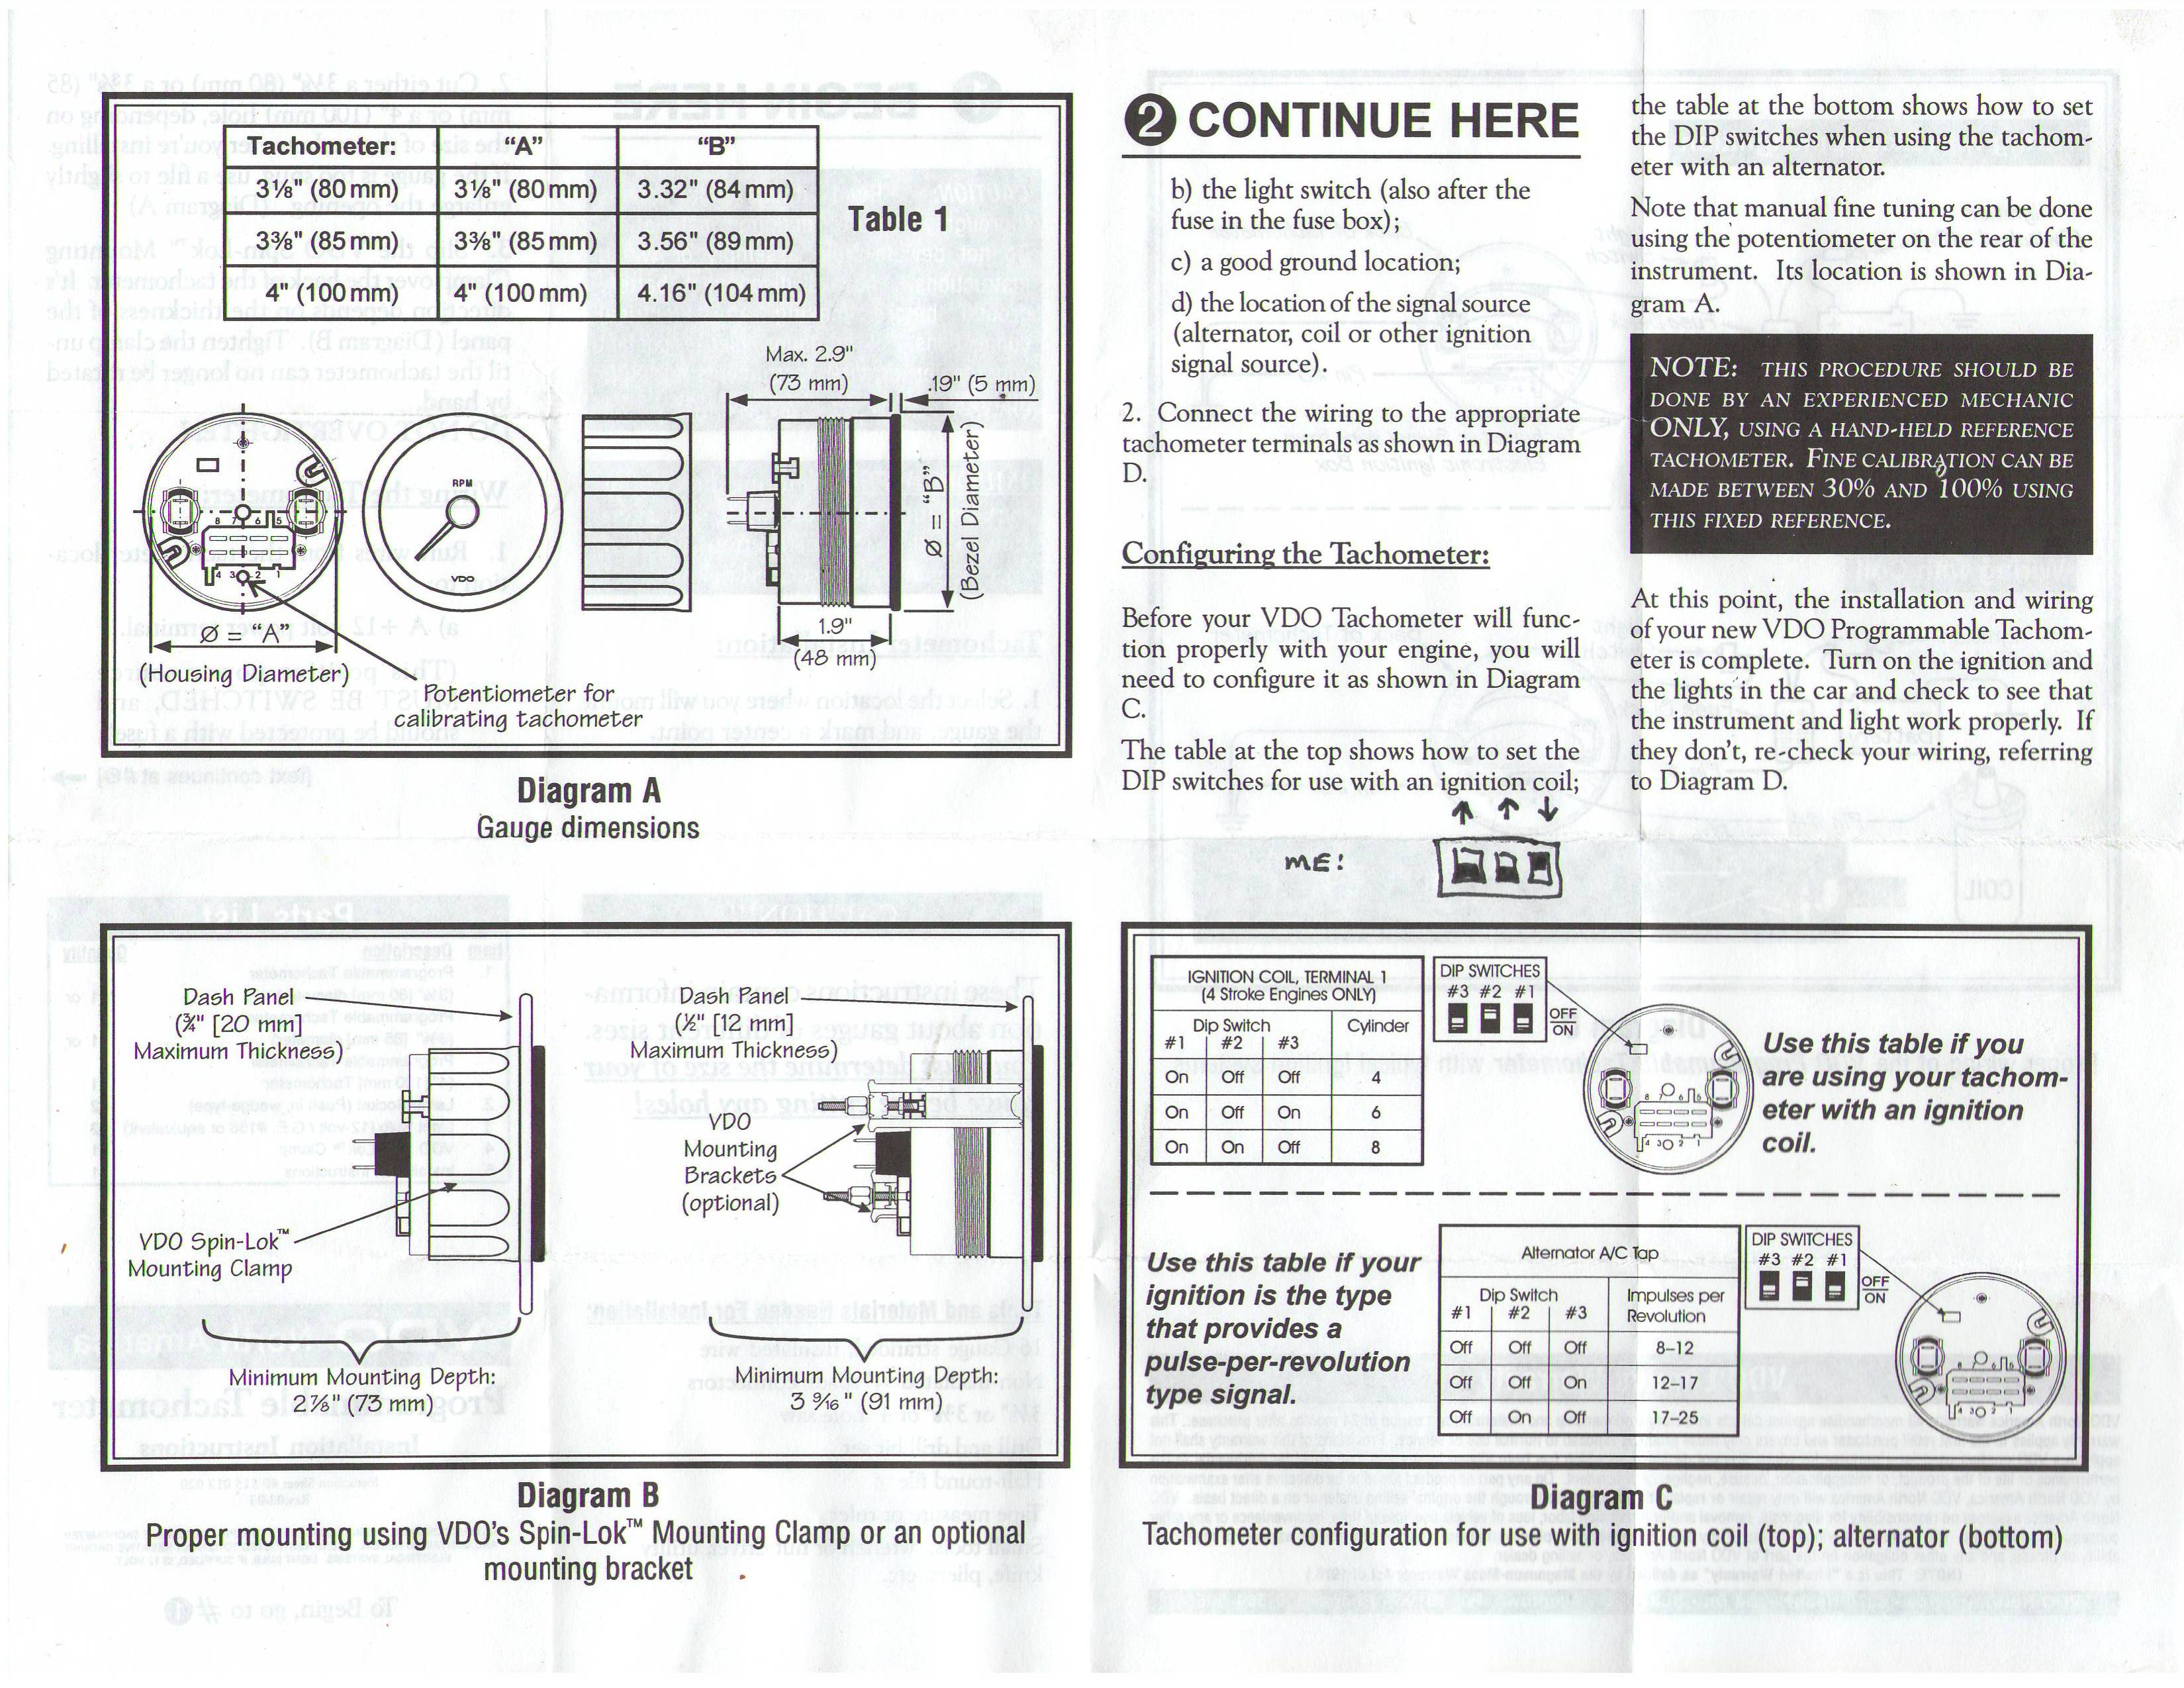 TheSamba.com :: VDO Programmable Tachometer Instructions